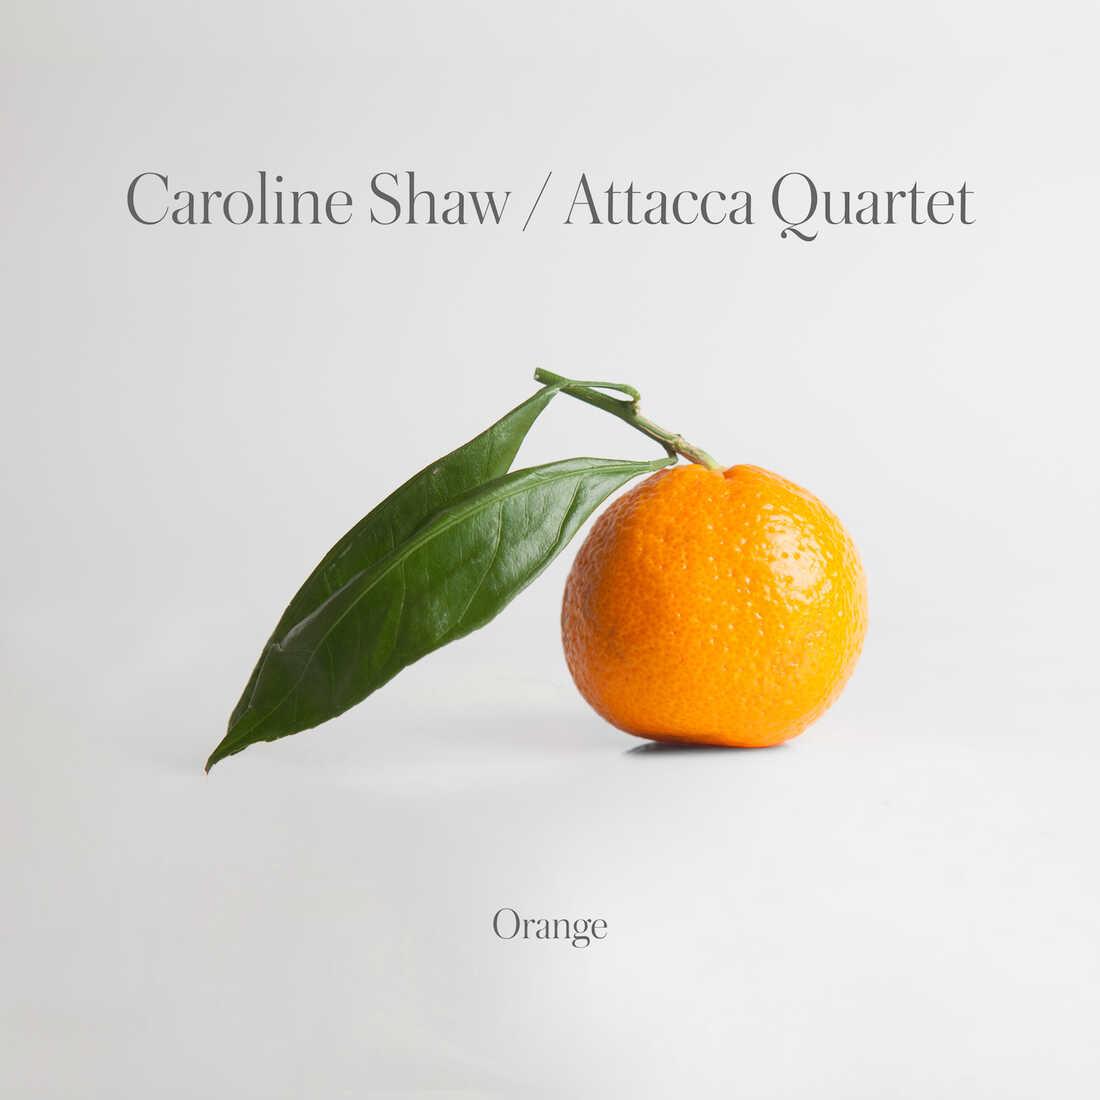 Caroline Shaw / Attacca Quartet, Orange